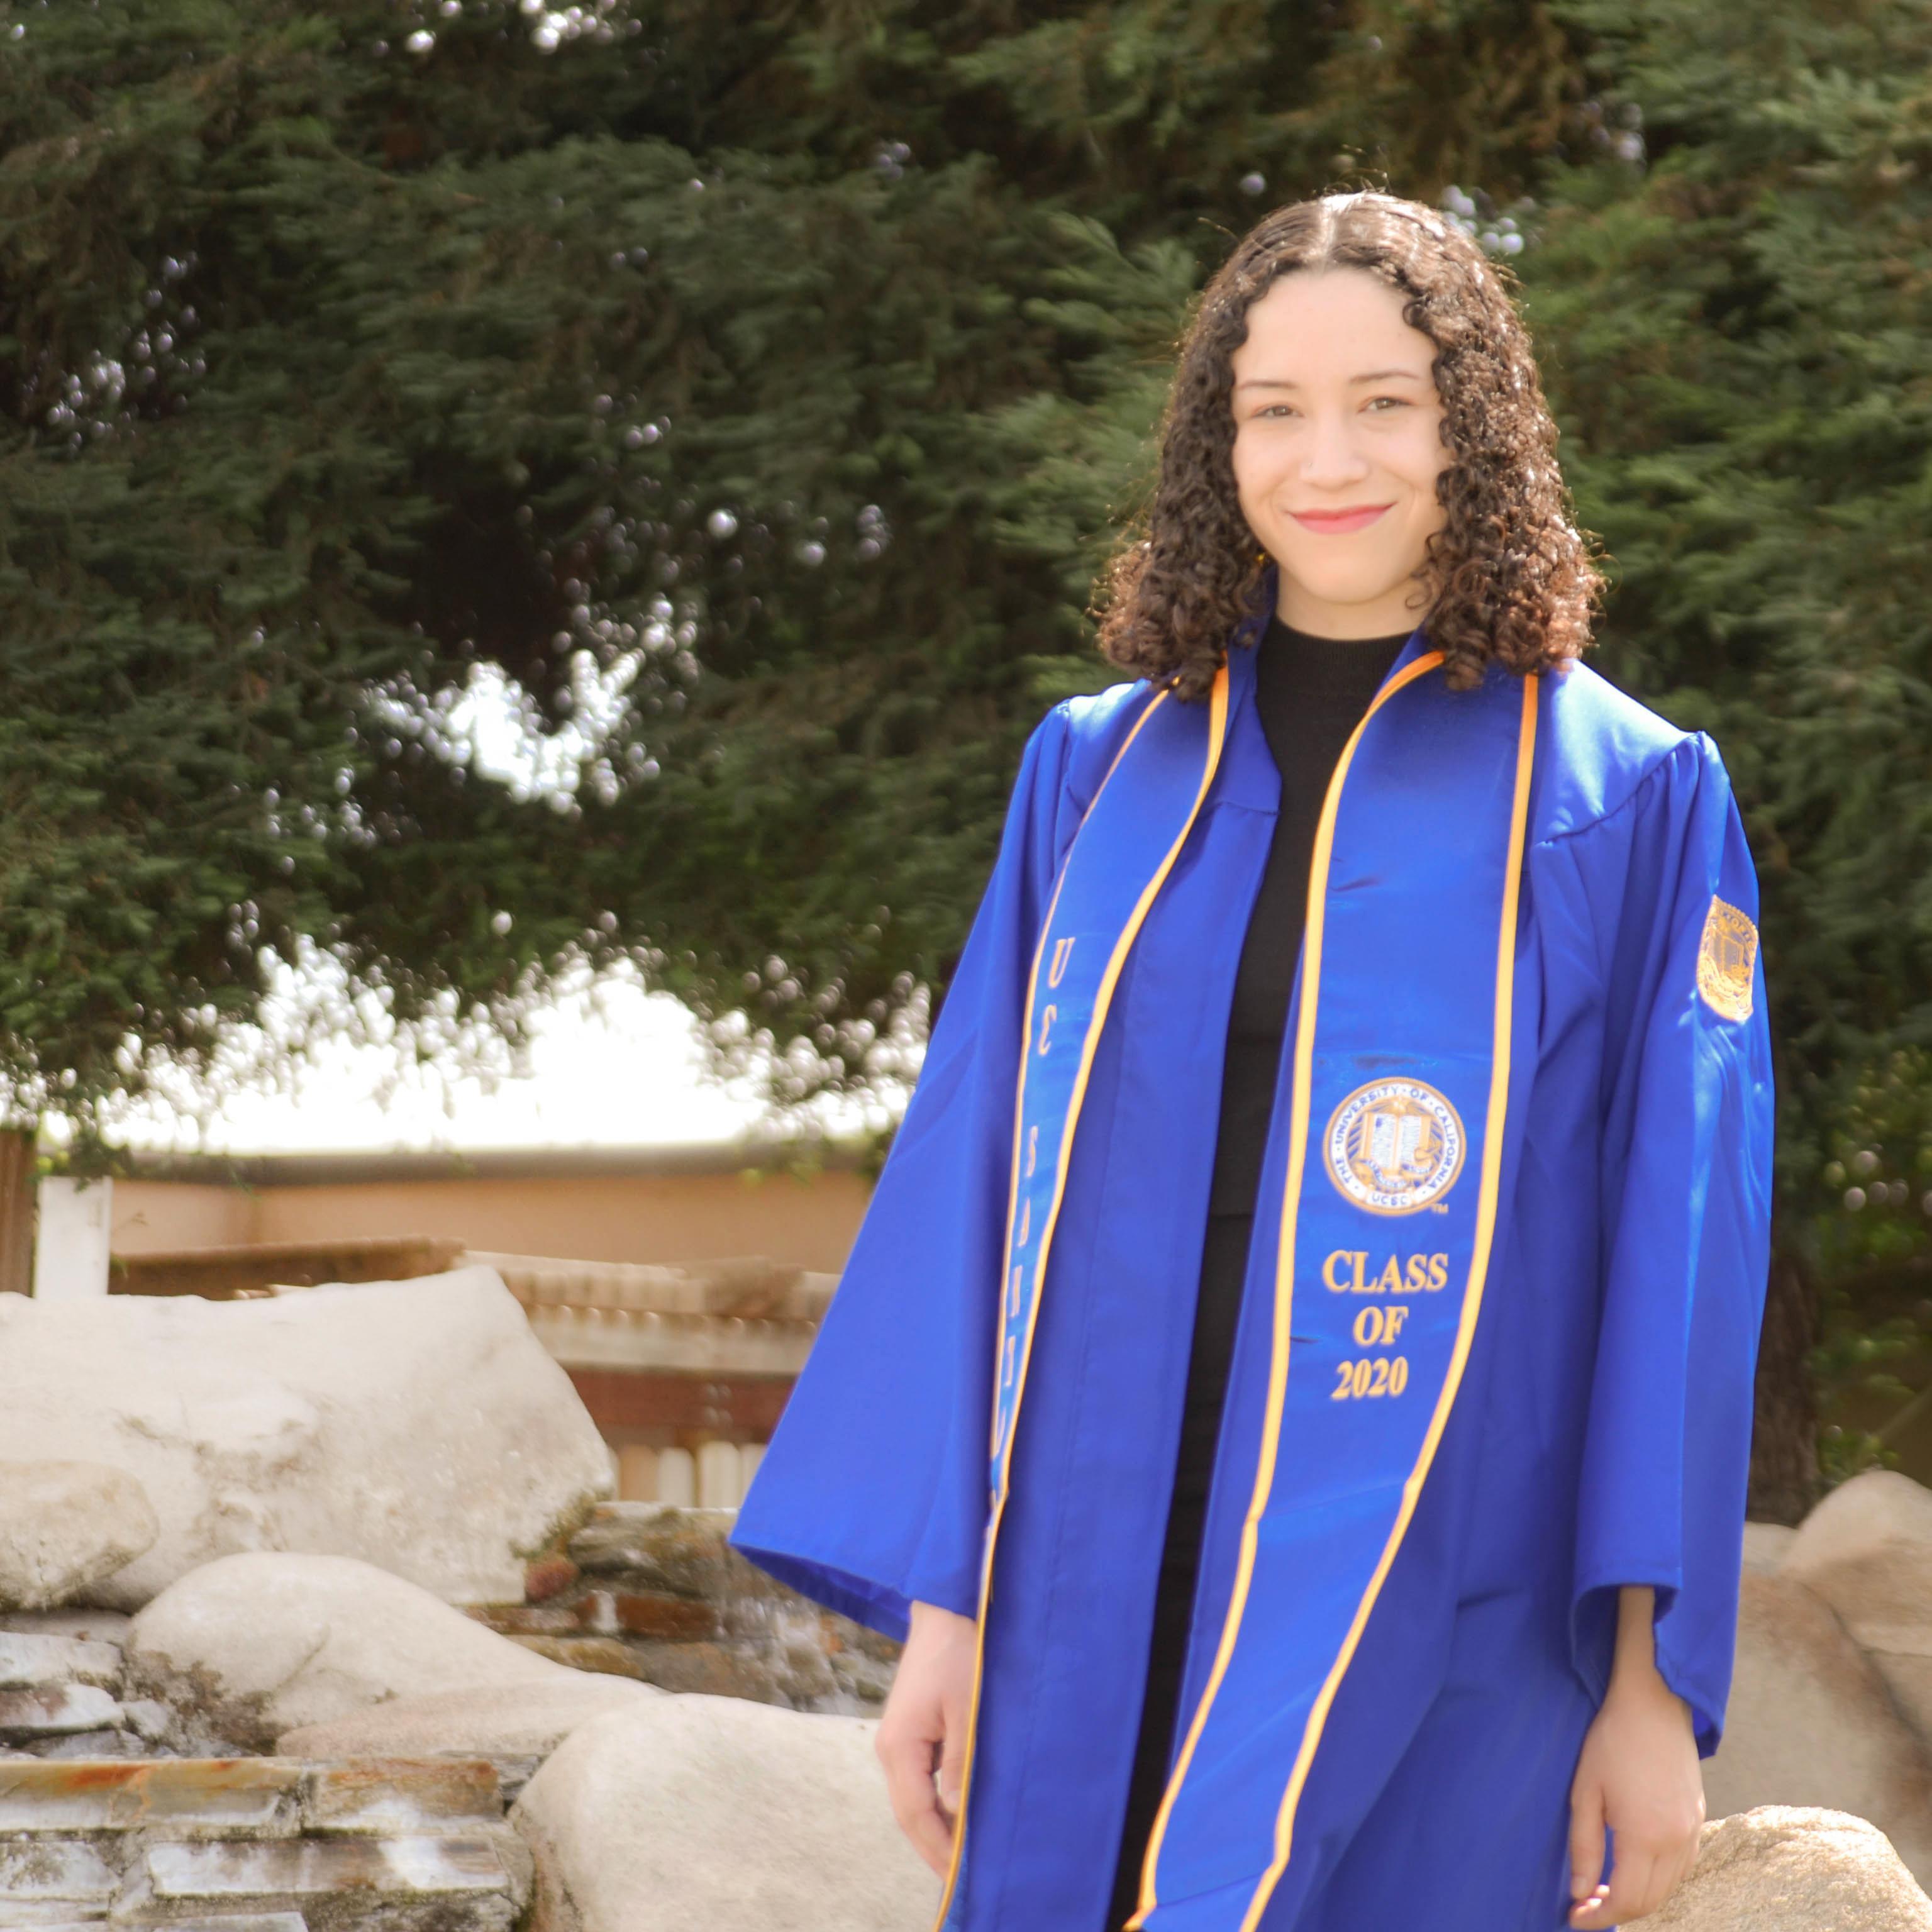 Siena Benavides's Profile Photo